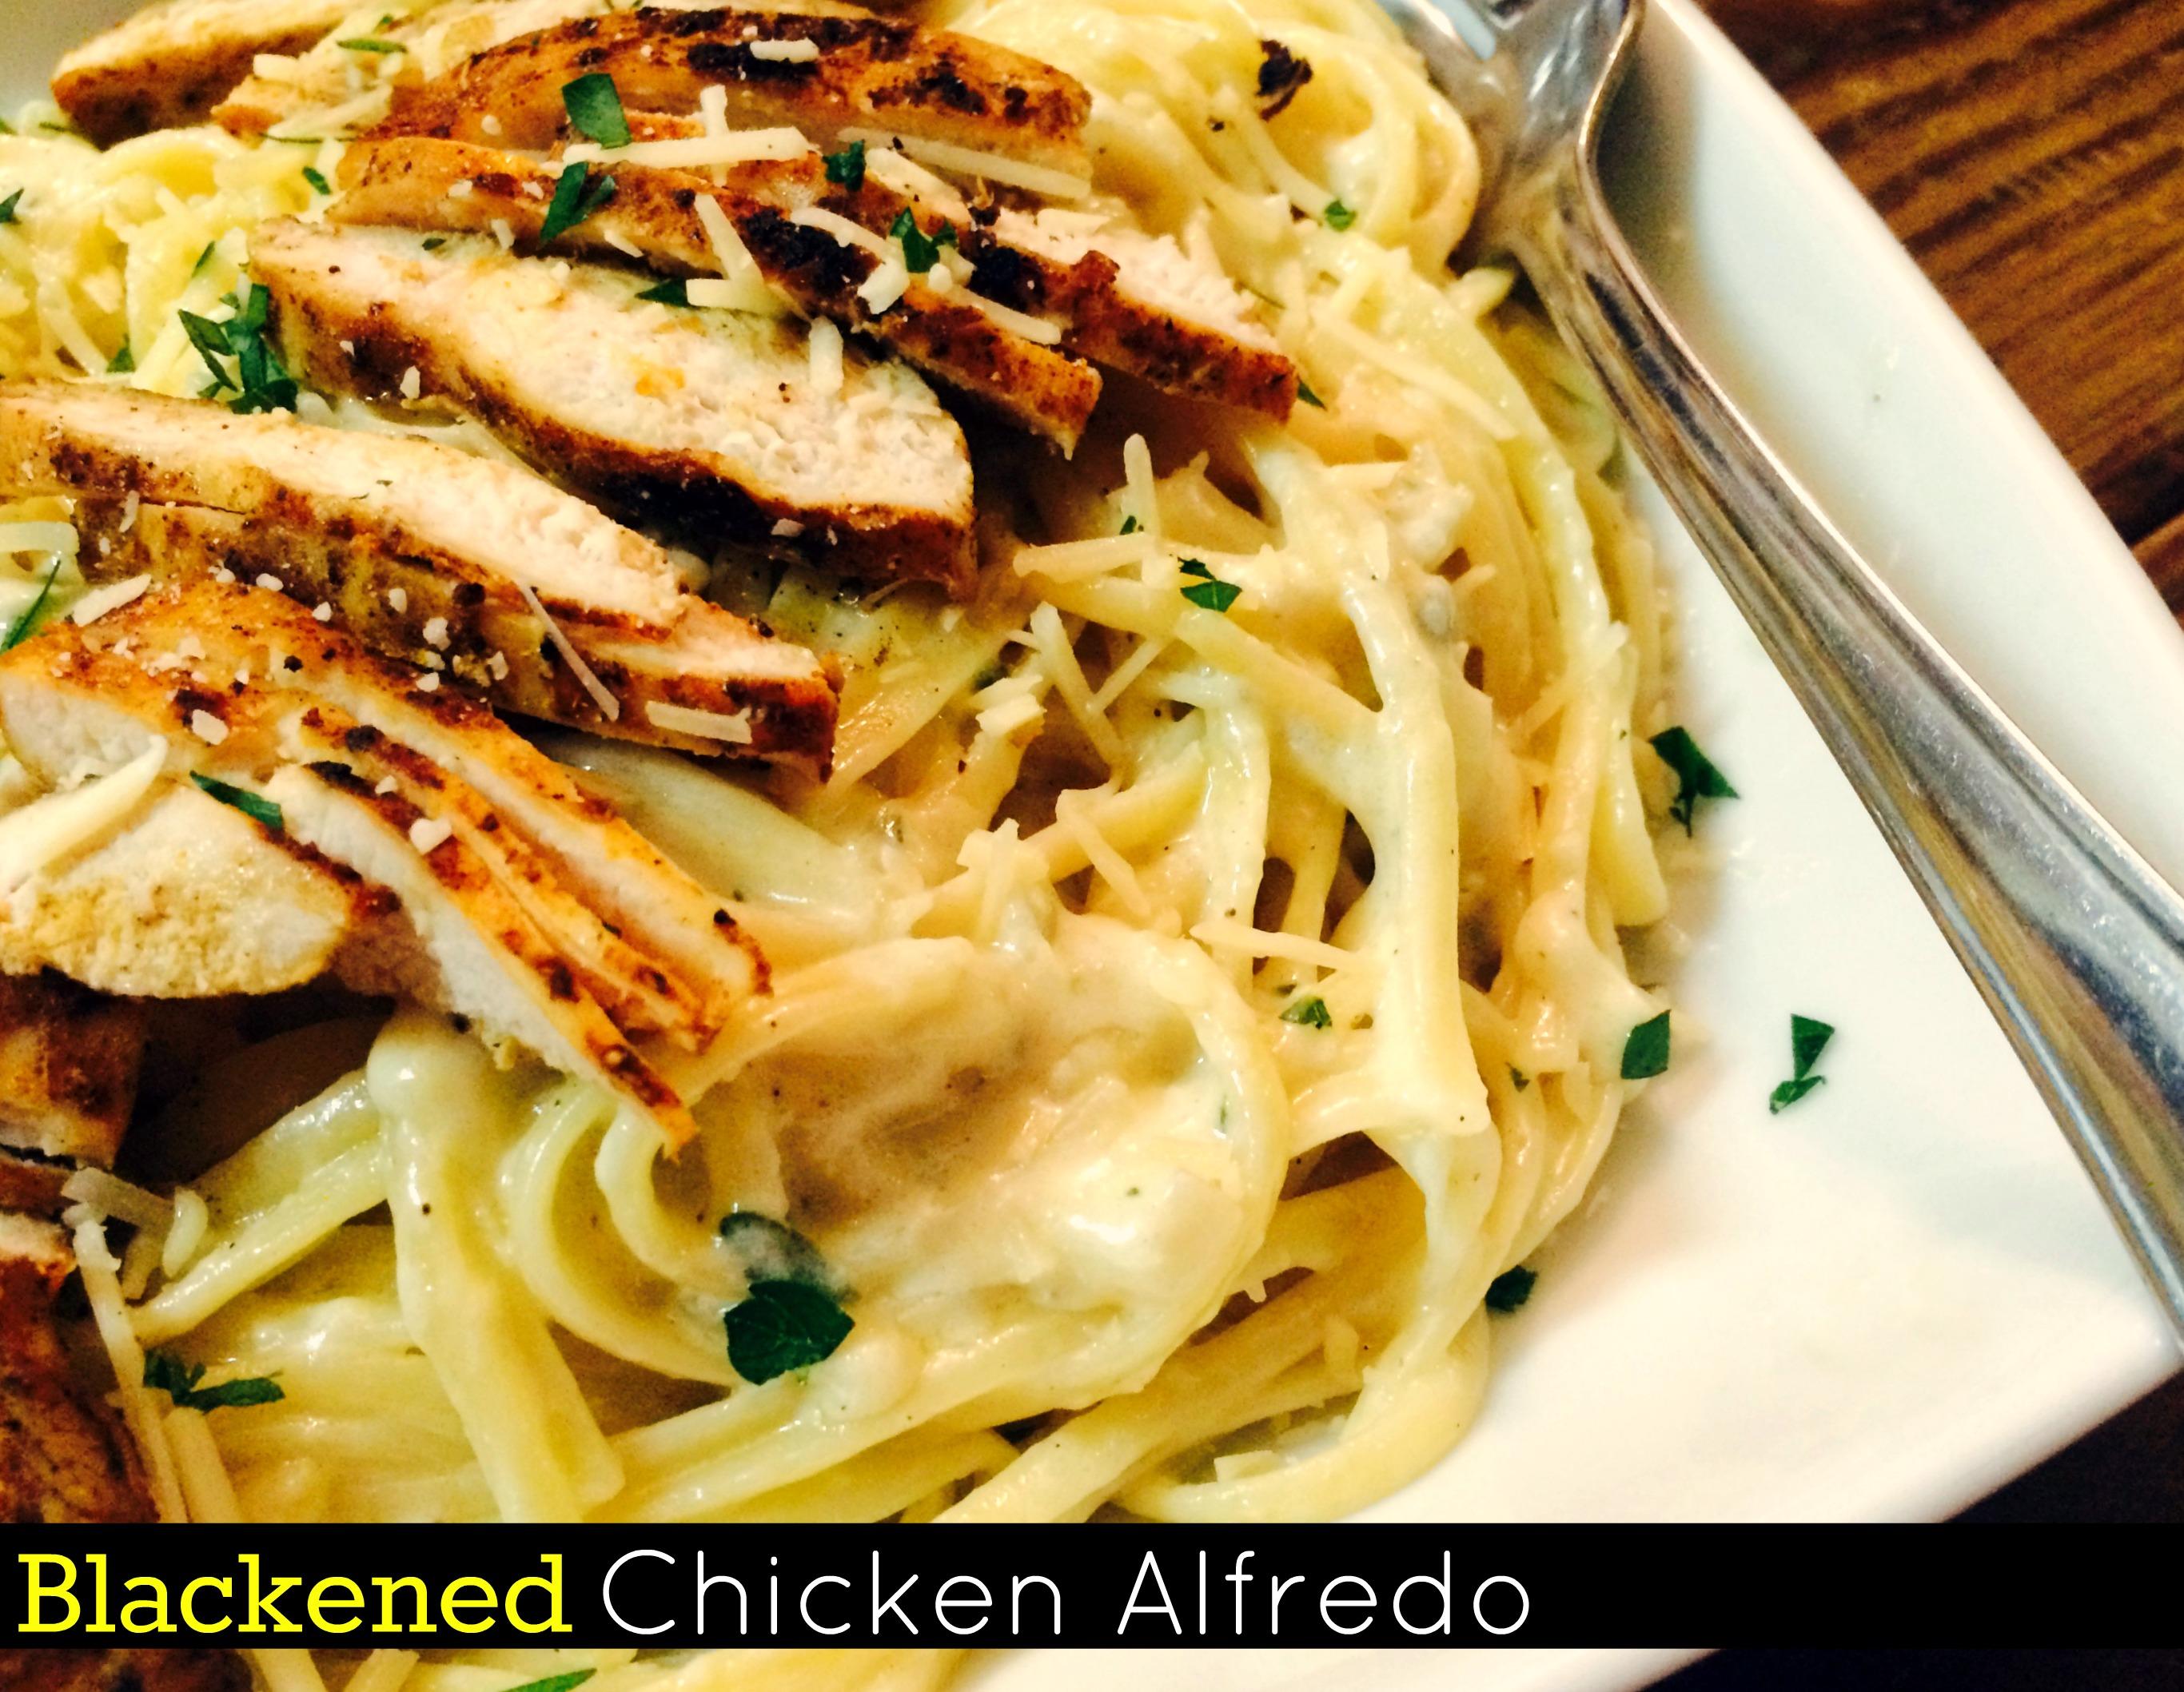 Blackened Chicken Alfredo